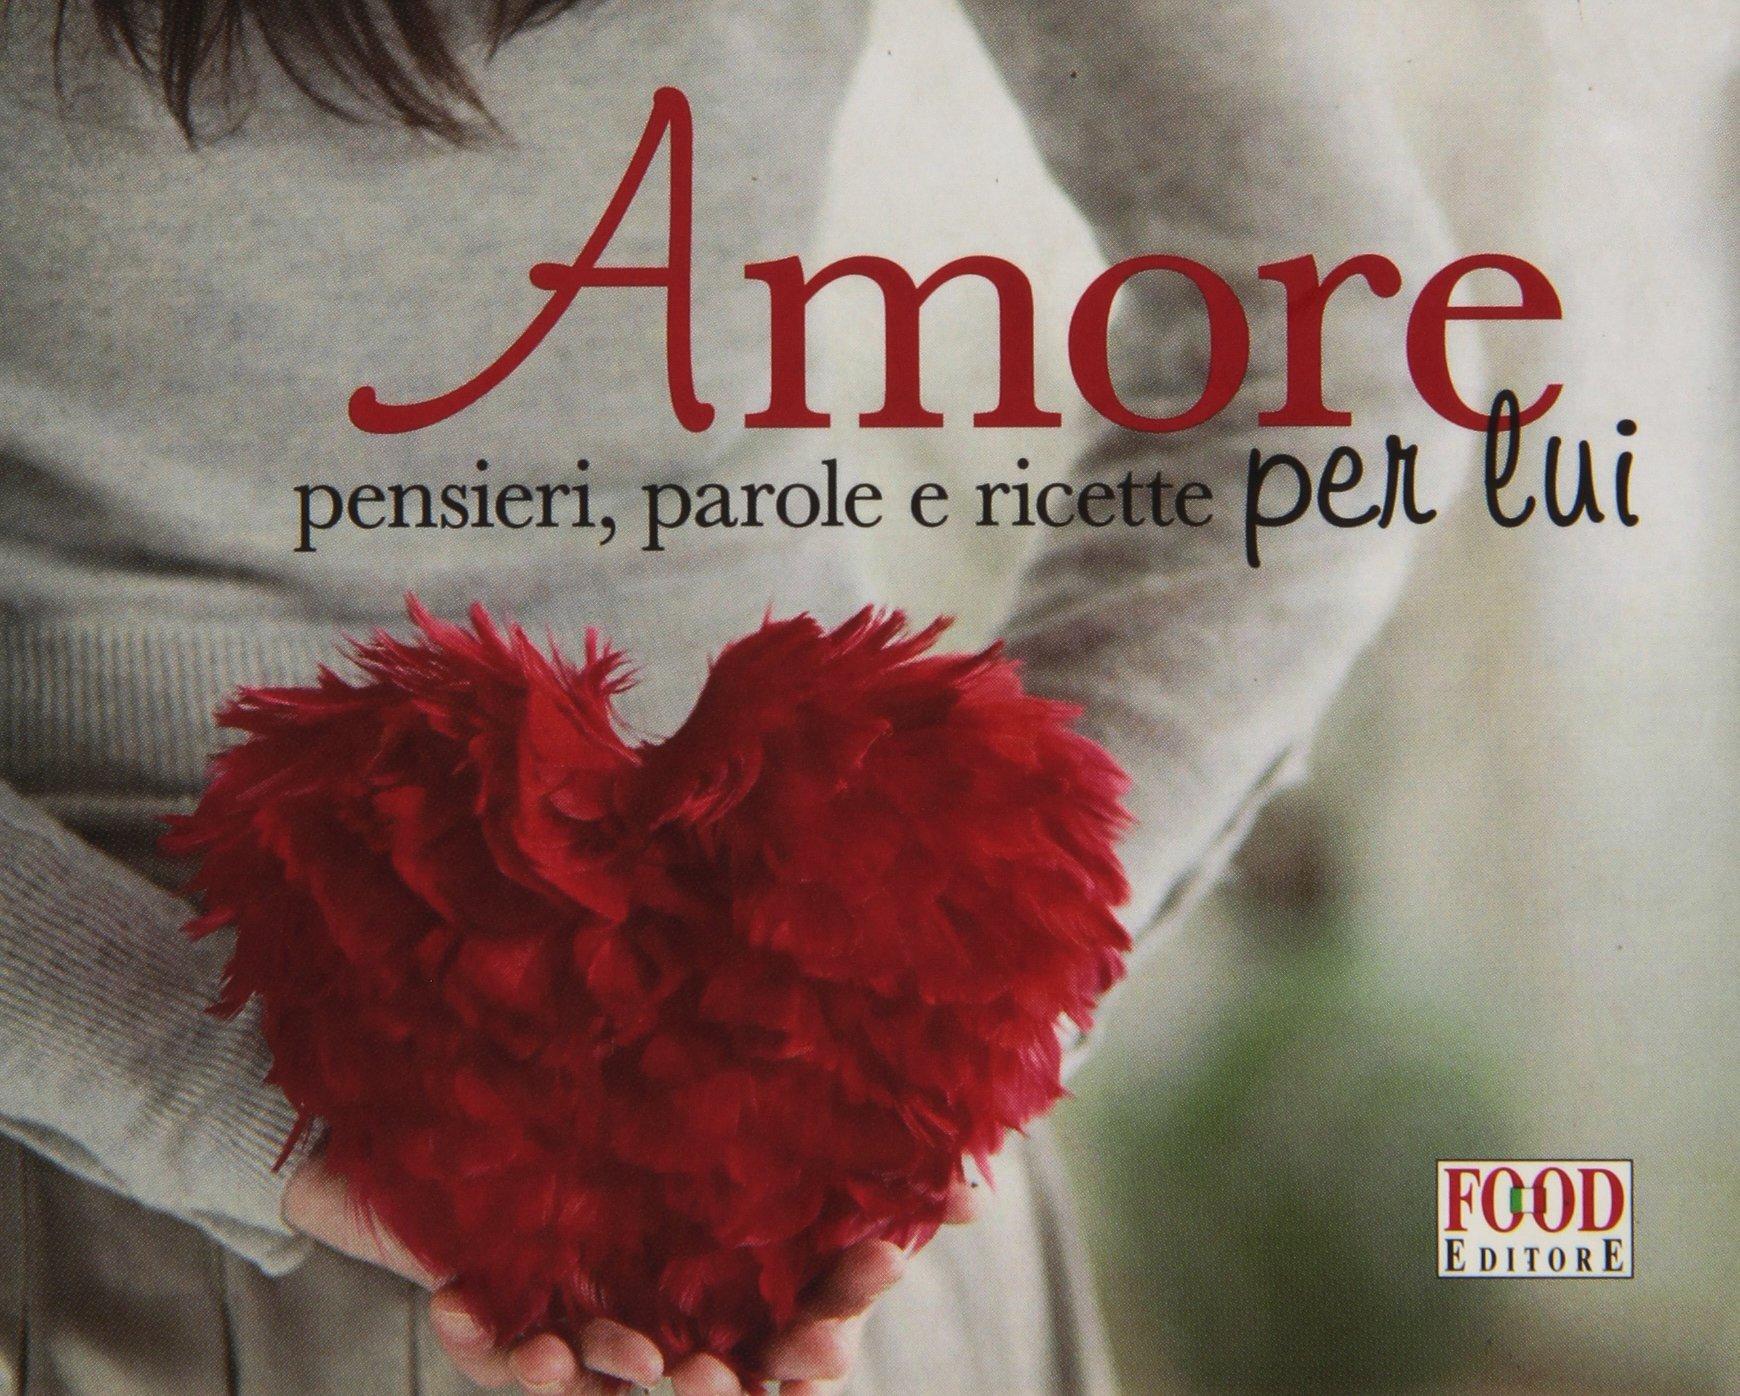 Amore Per Lui Pensieri Parole E Ricette 9788861540415 Amazoncom